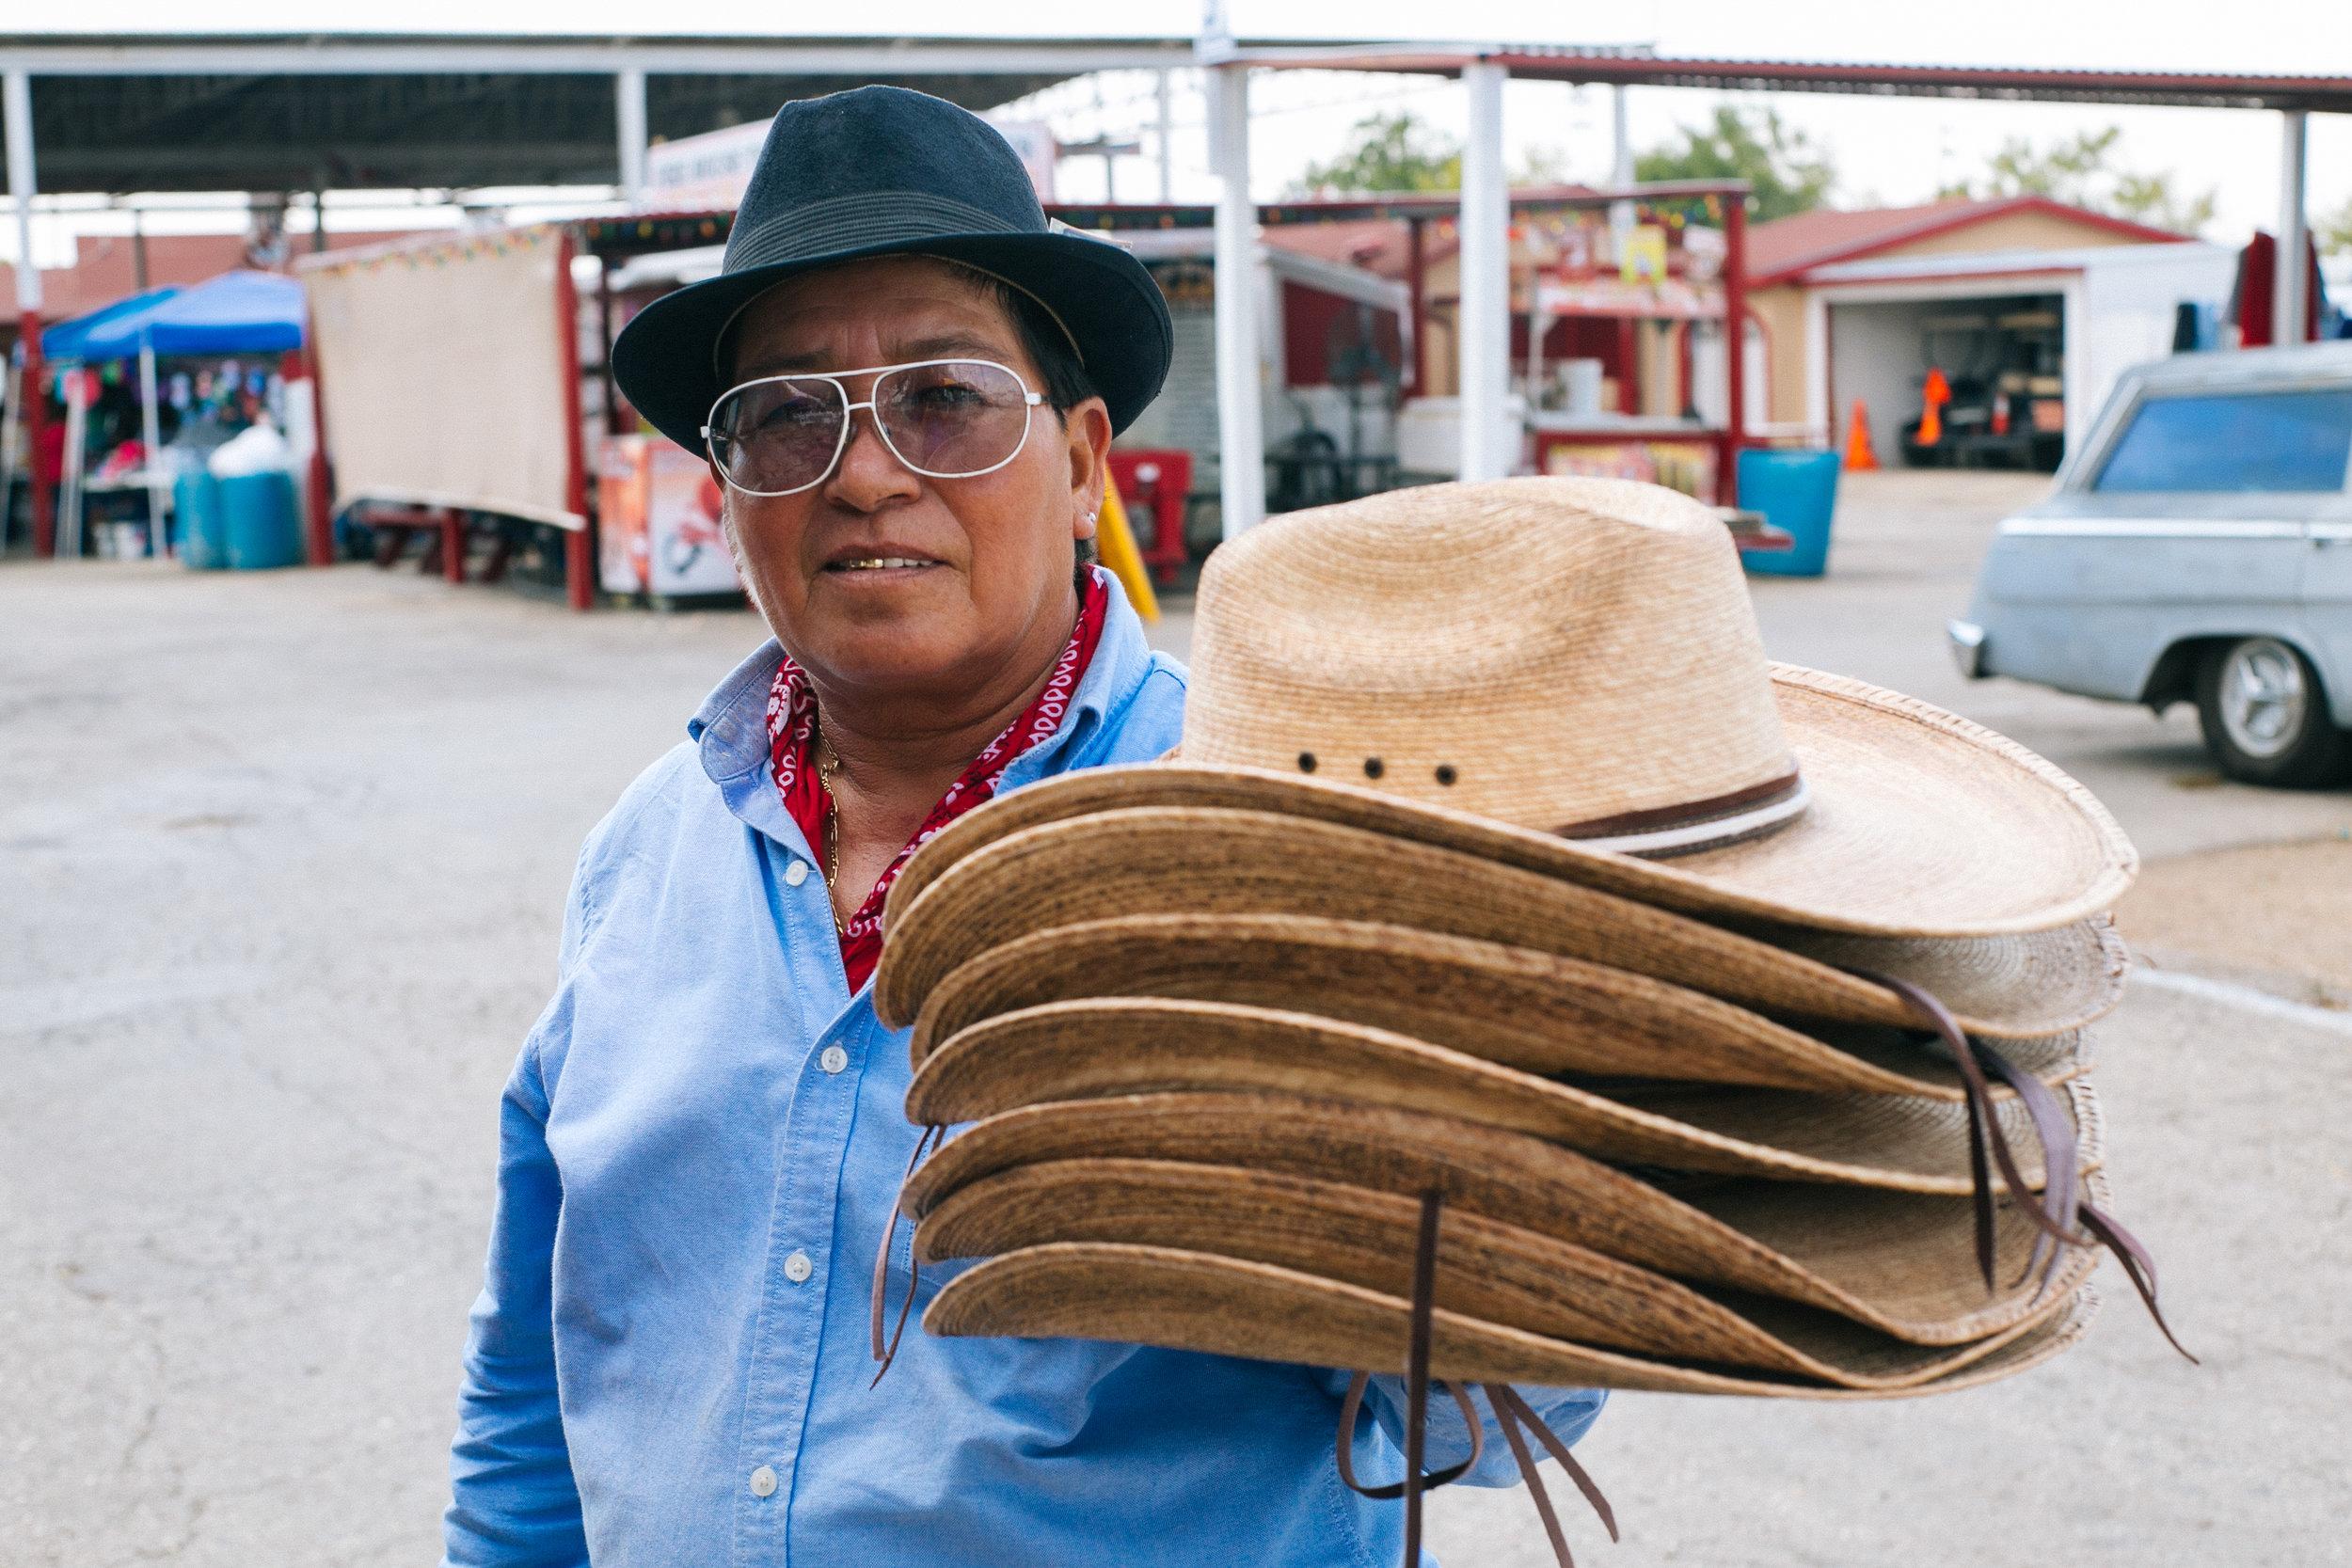 Sombrero vendor, San Antonio, Texas 2015